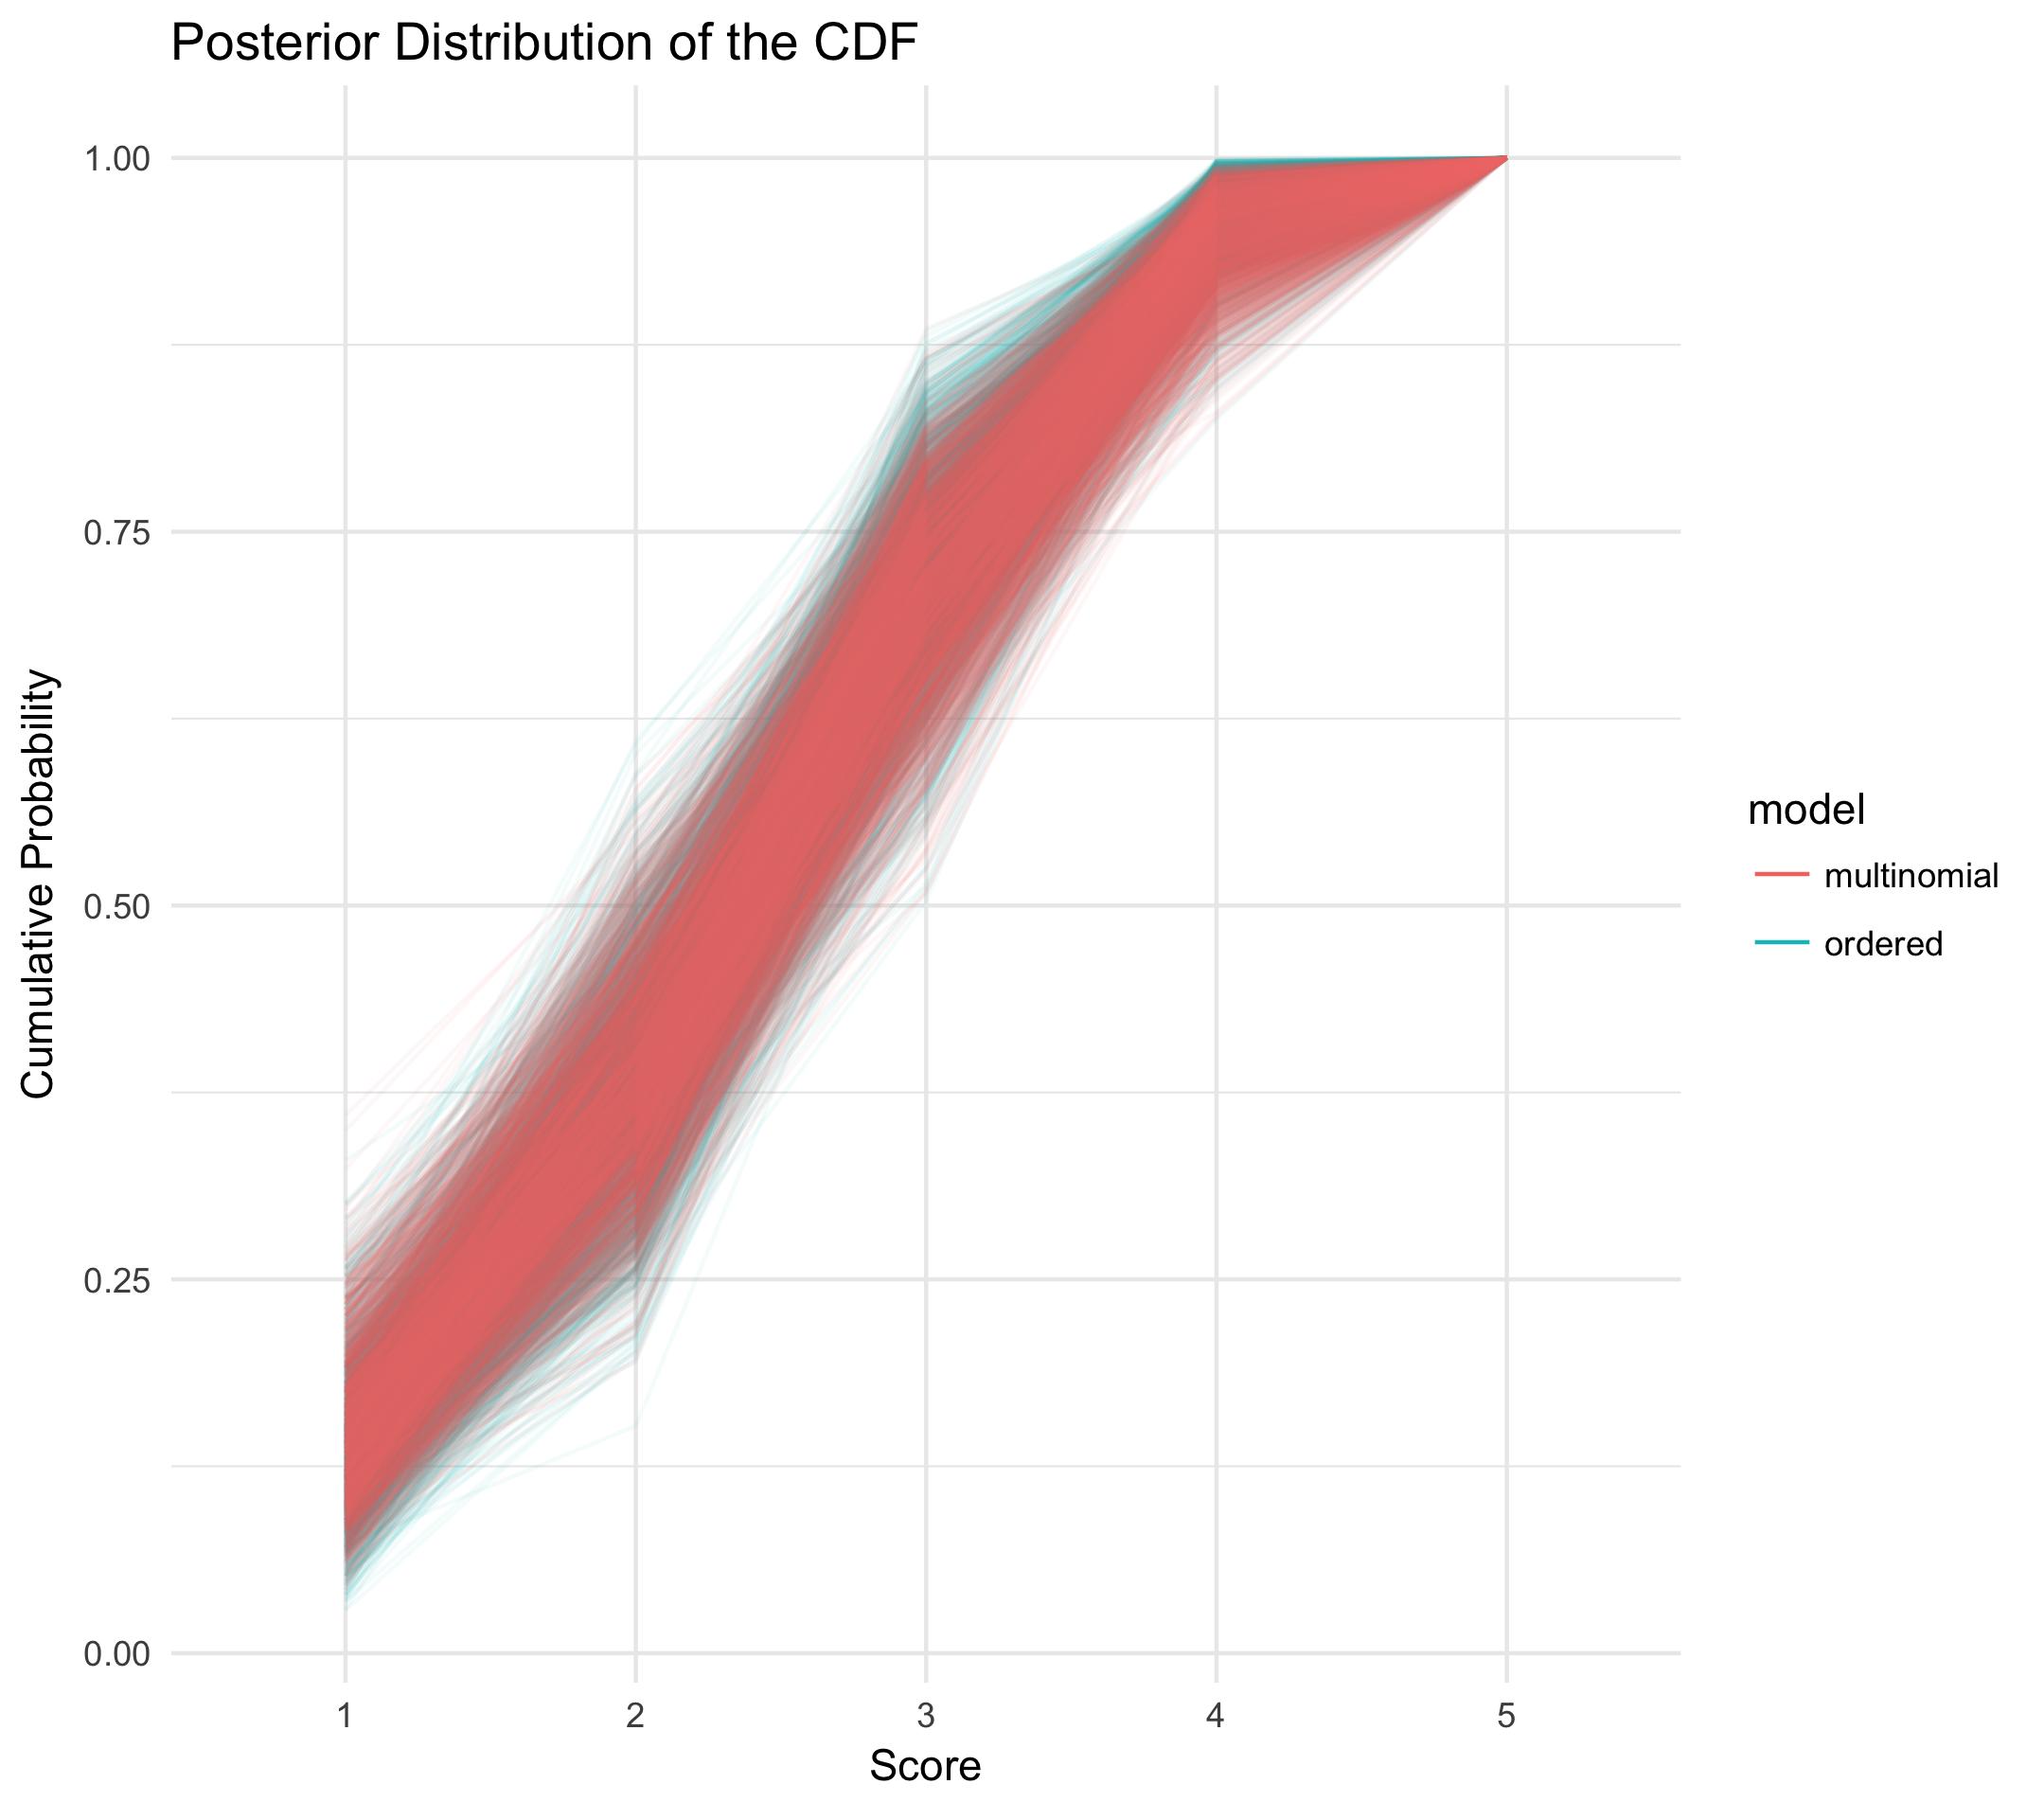 comparative posterior cumulative distributions